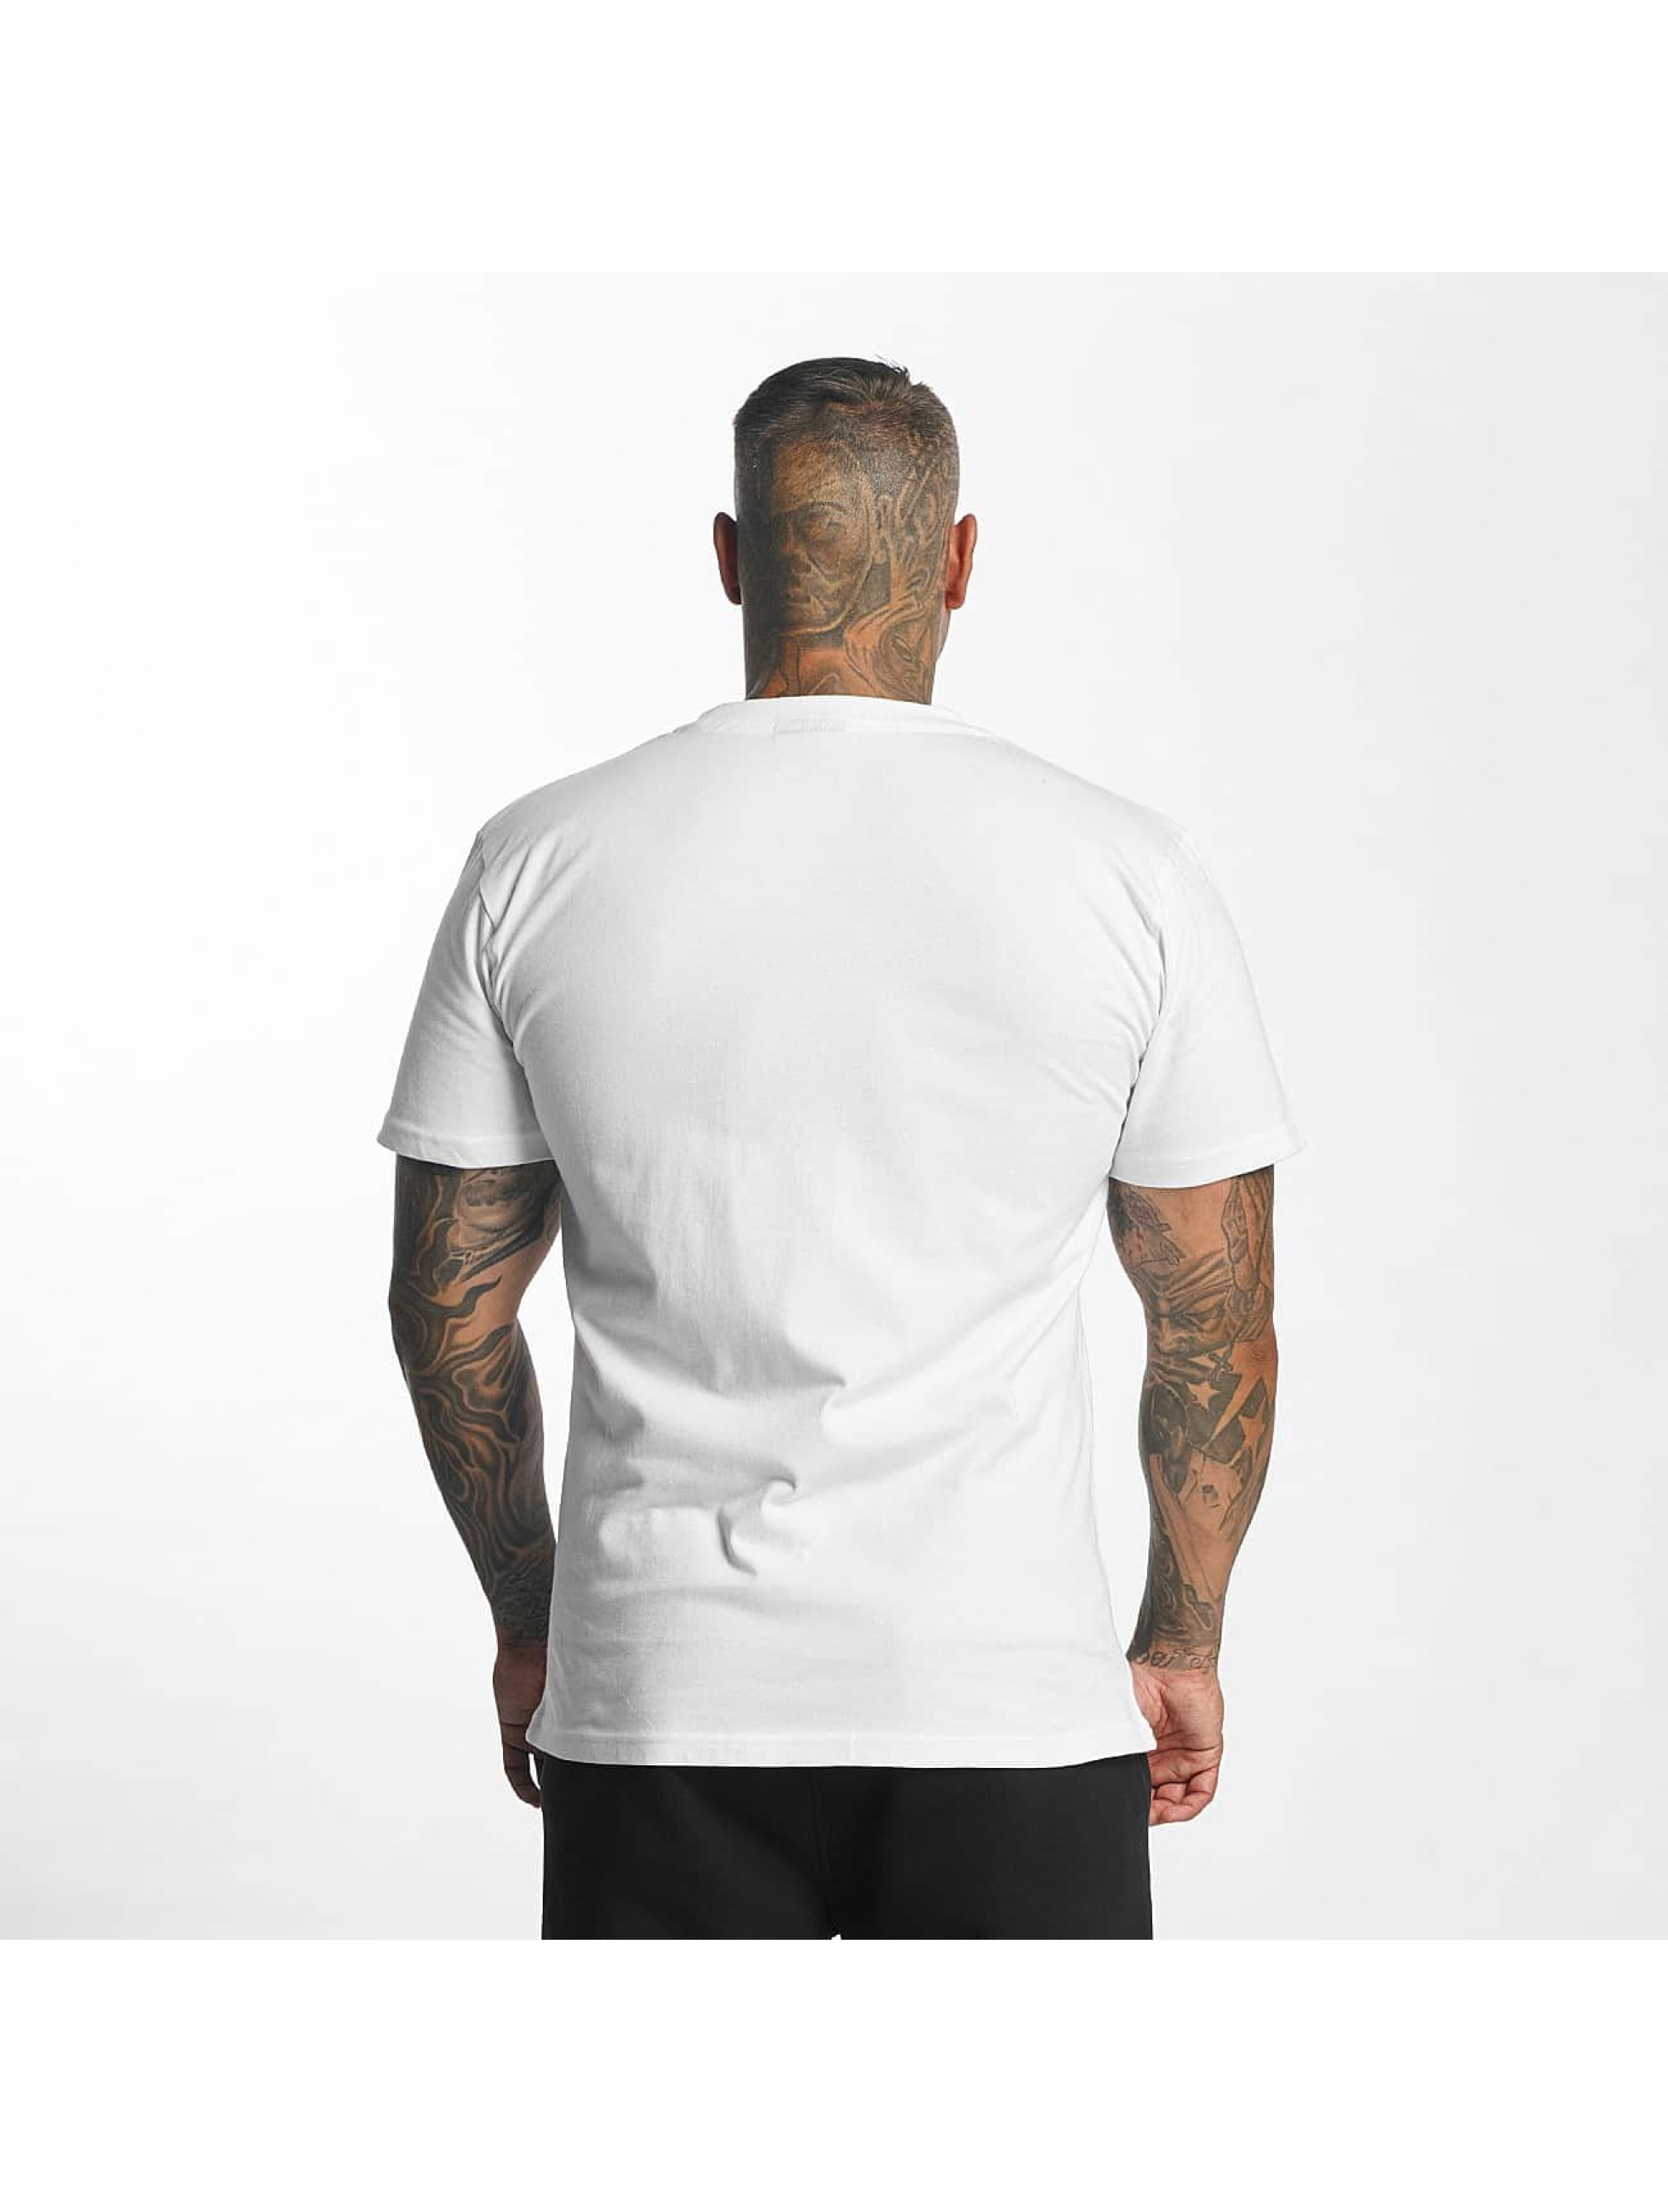 Pure Hate T-Shirt Hand Grenade white